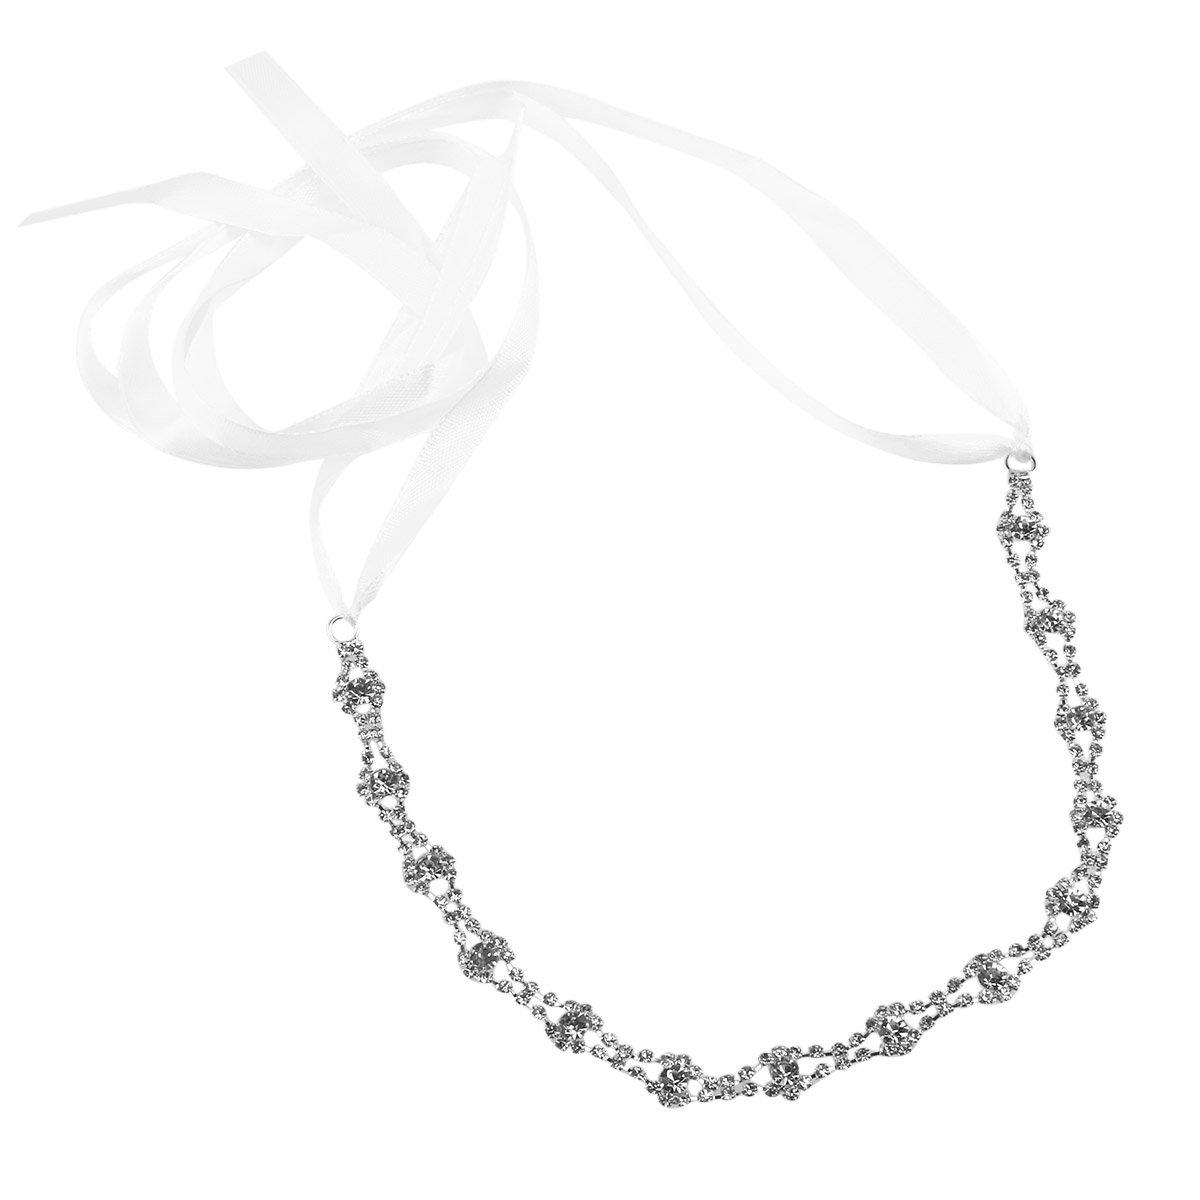 LEORX Le donne Hairband capelli Clip nuziale strass Bendable decorato rombo stile Hairband (argento)